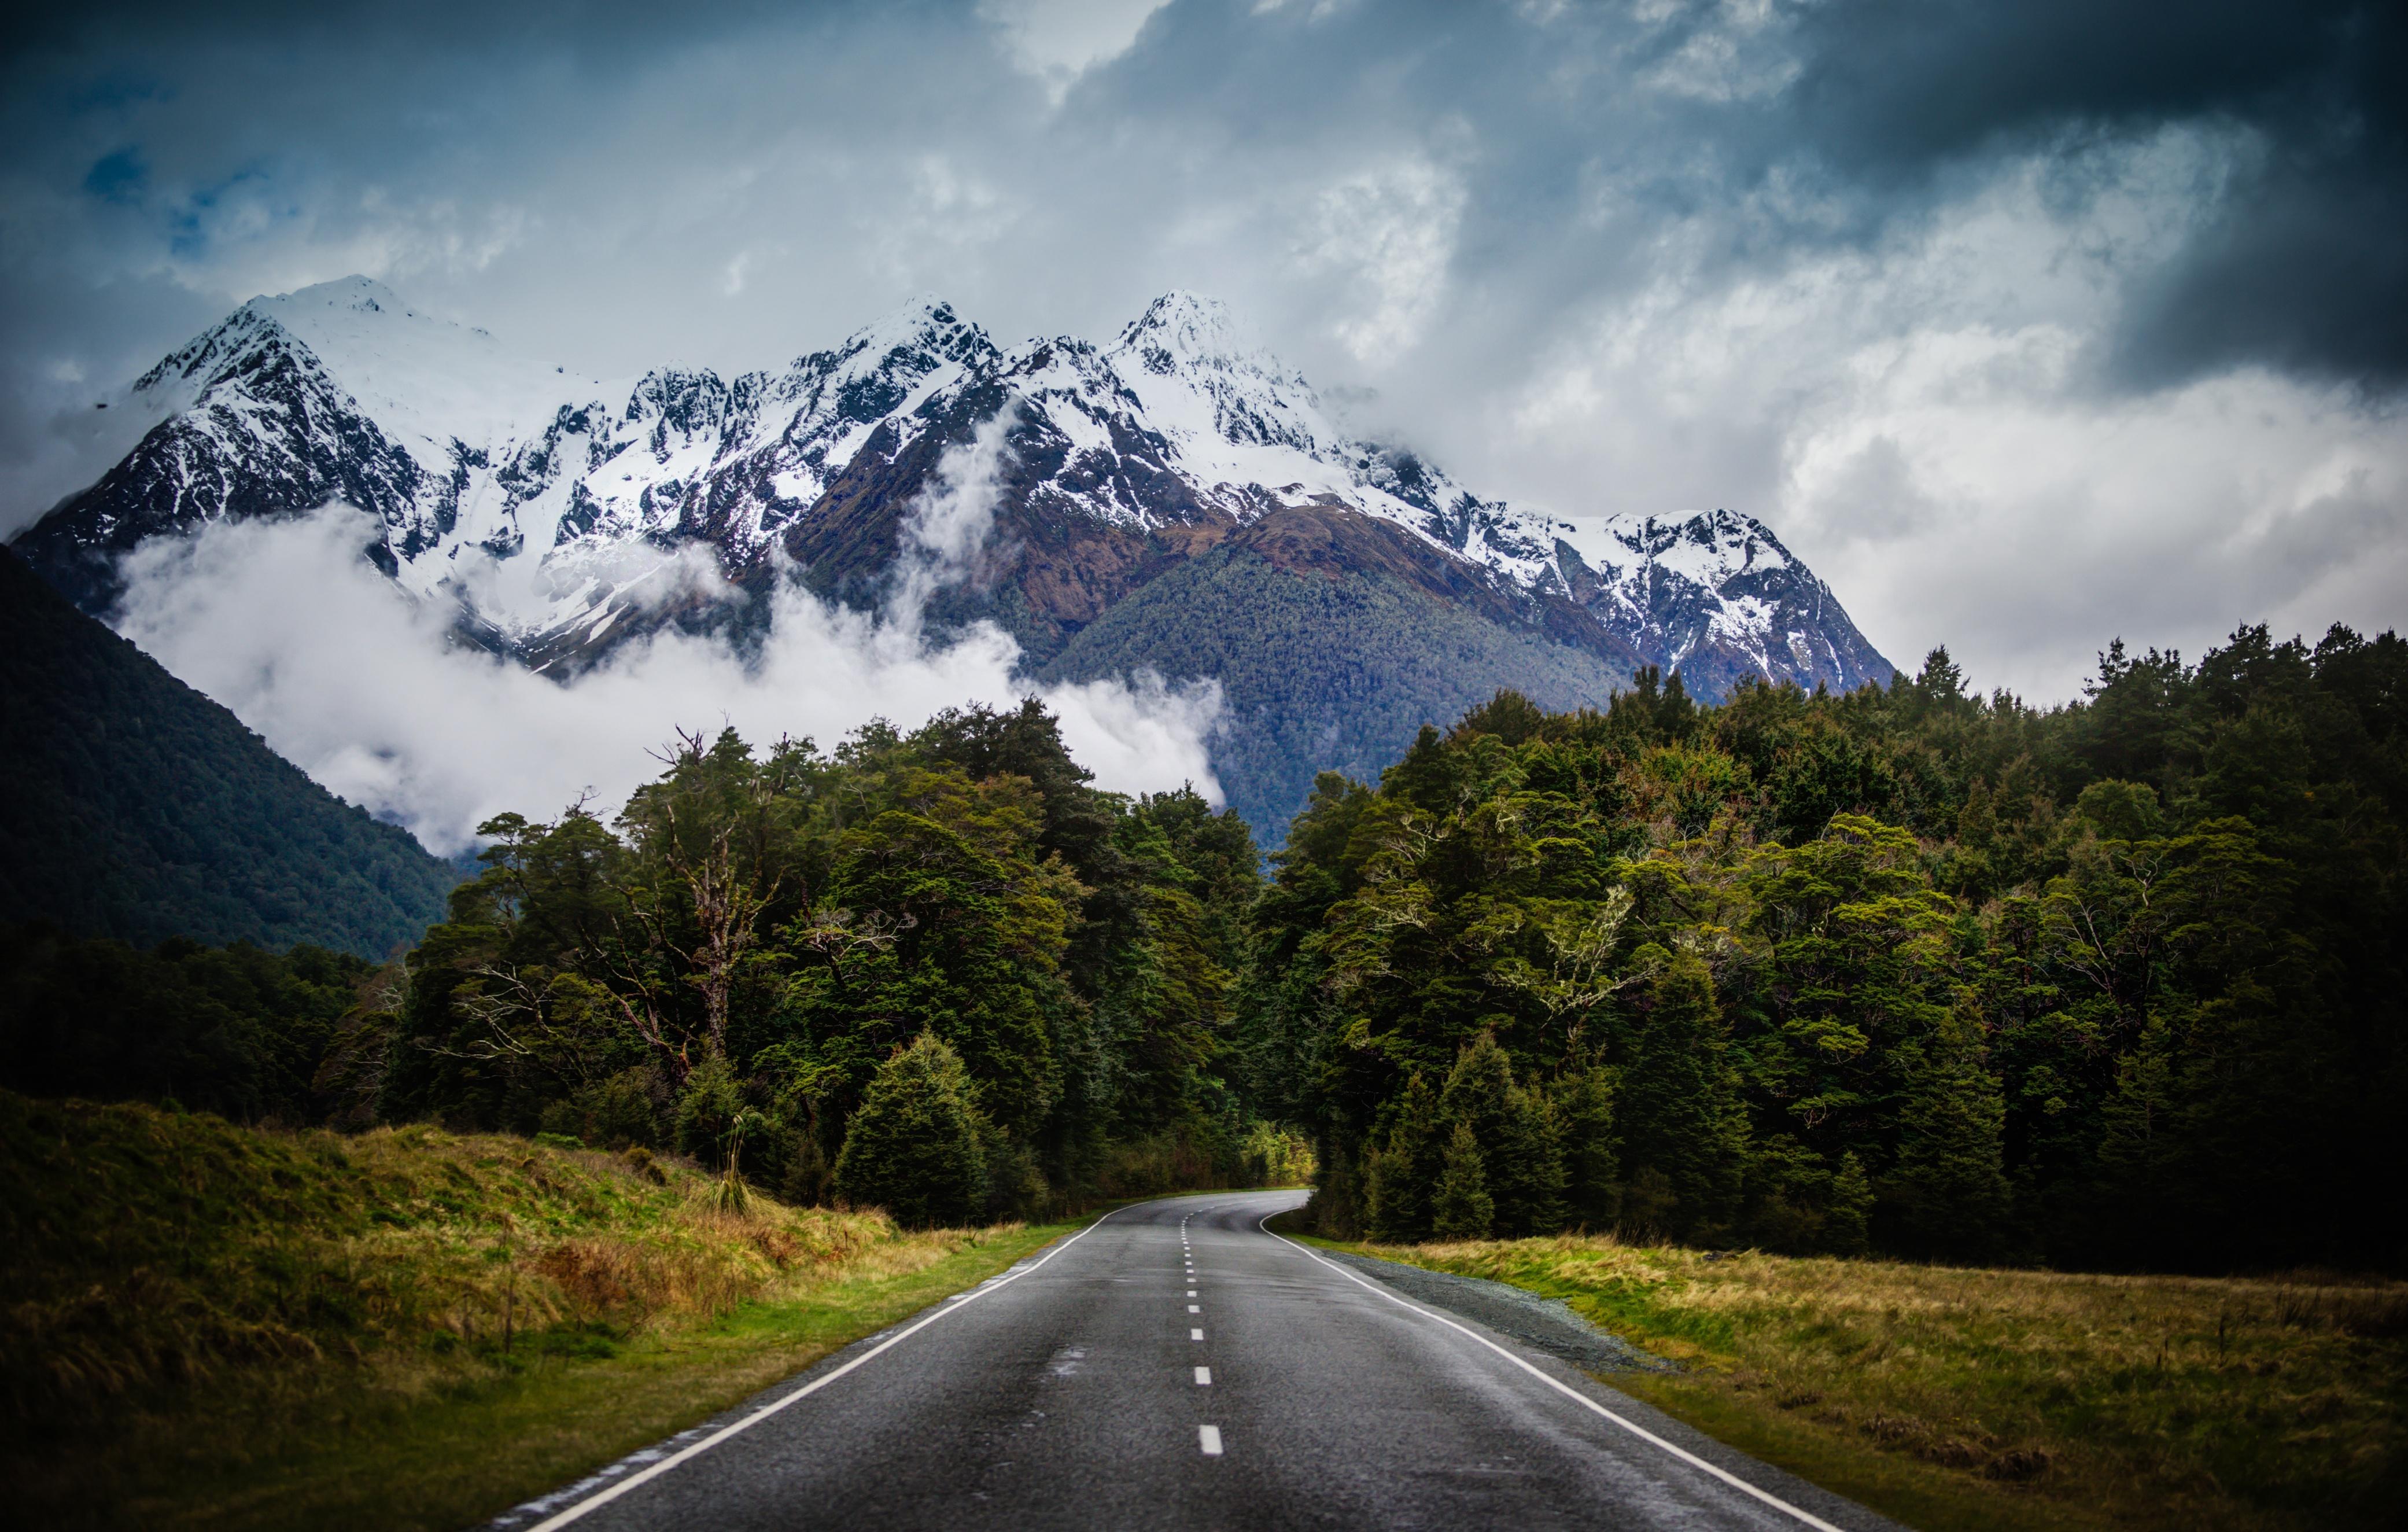 Aoraki/Mount Cook 4k Ultra HD Wallpaper